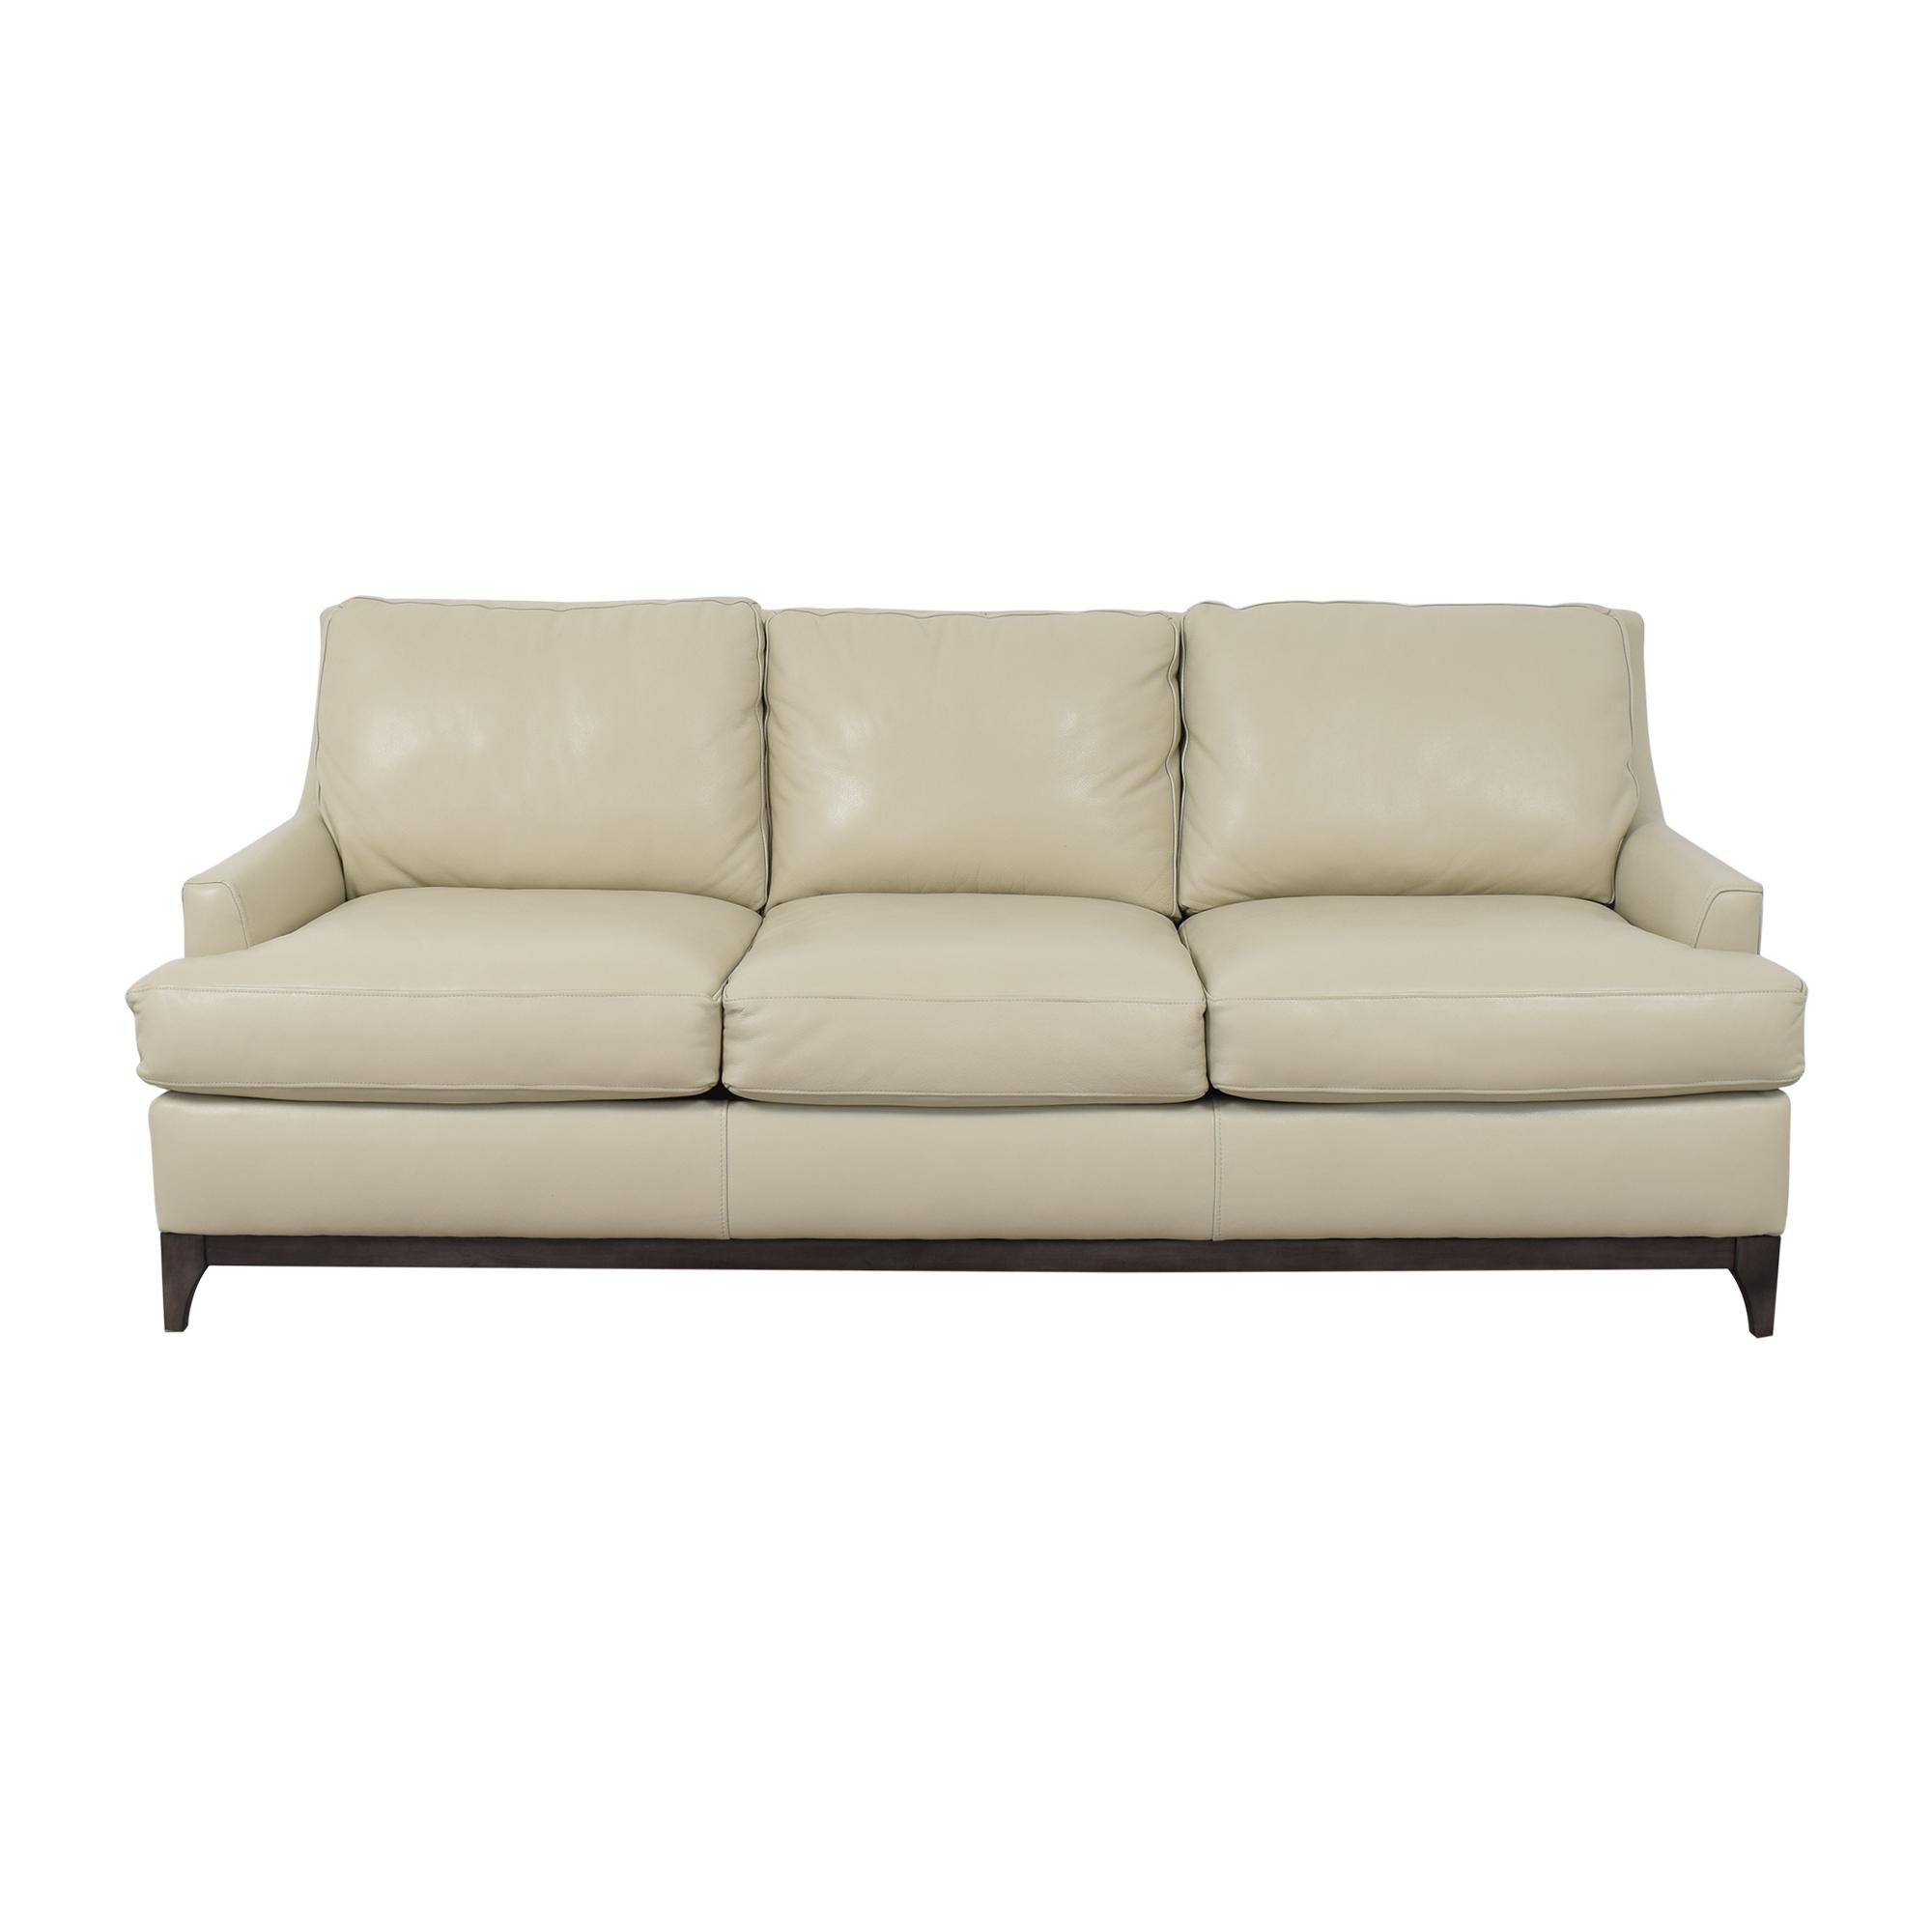 Macy's Macy's Skylee Three Cushion Sofa price